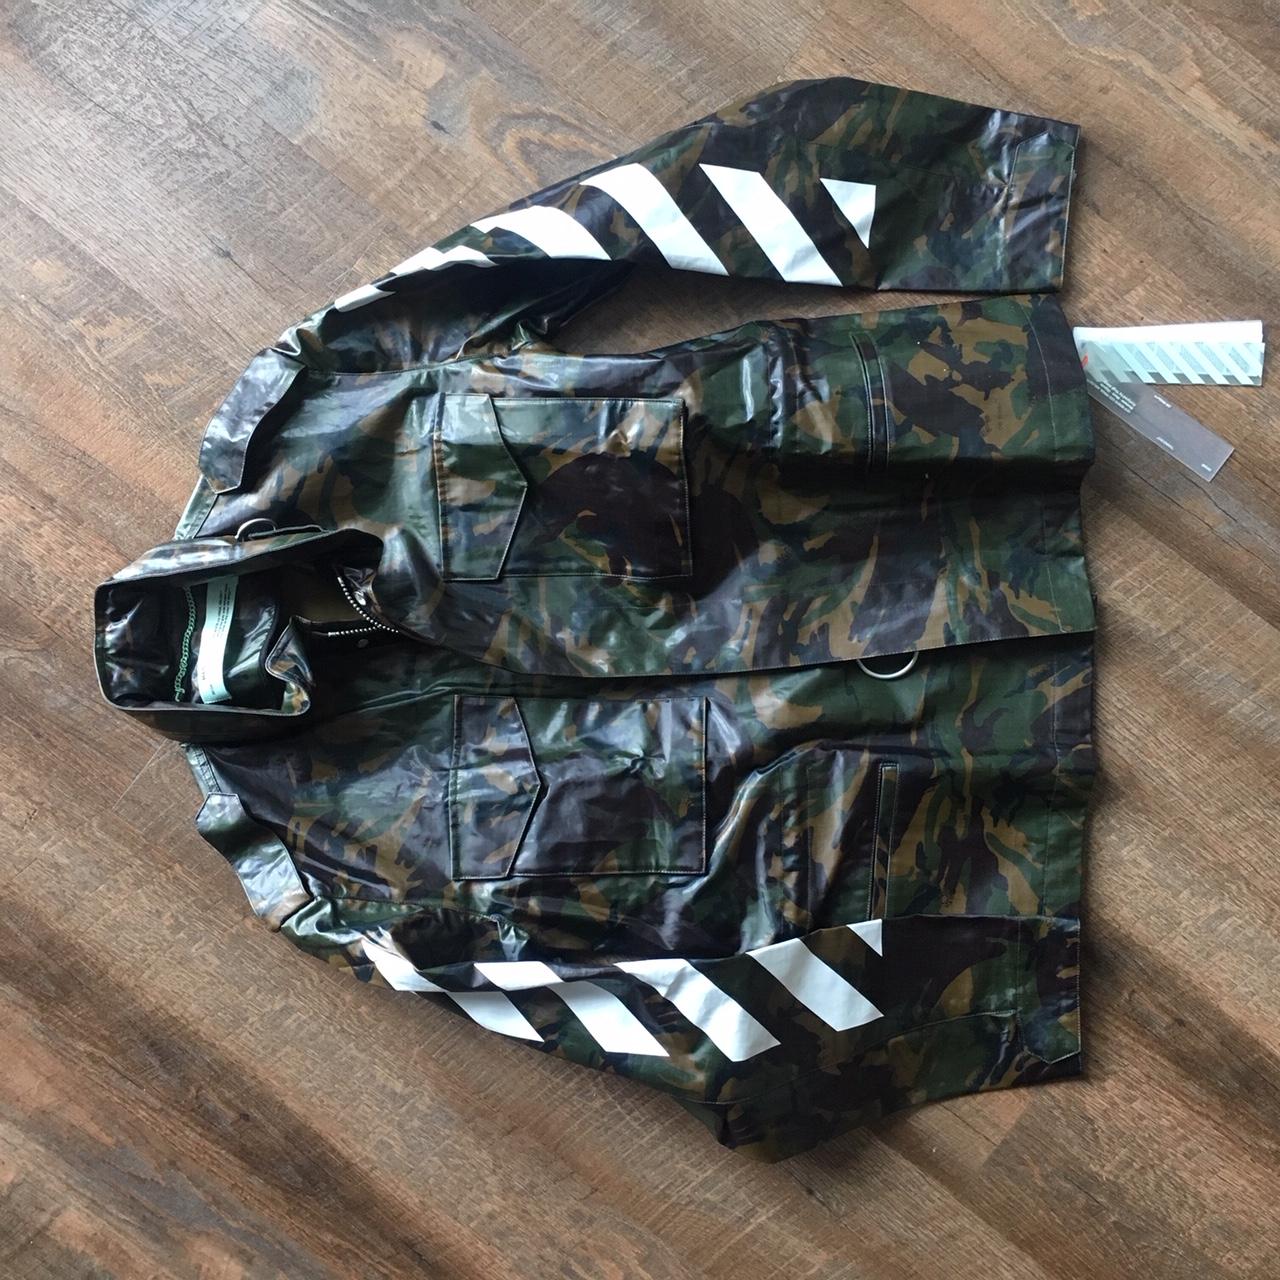 def0e14237357 Off-White: Diagonal M65 Camo Jacket on Storenvy